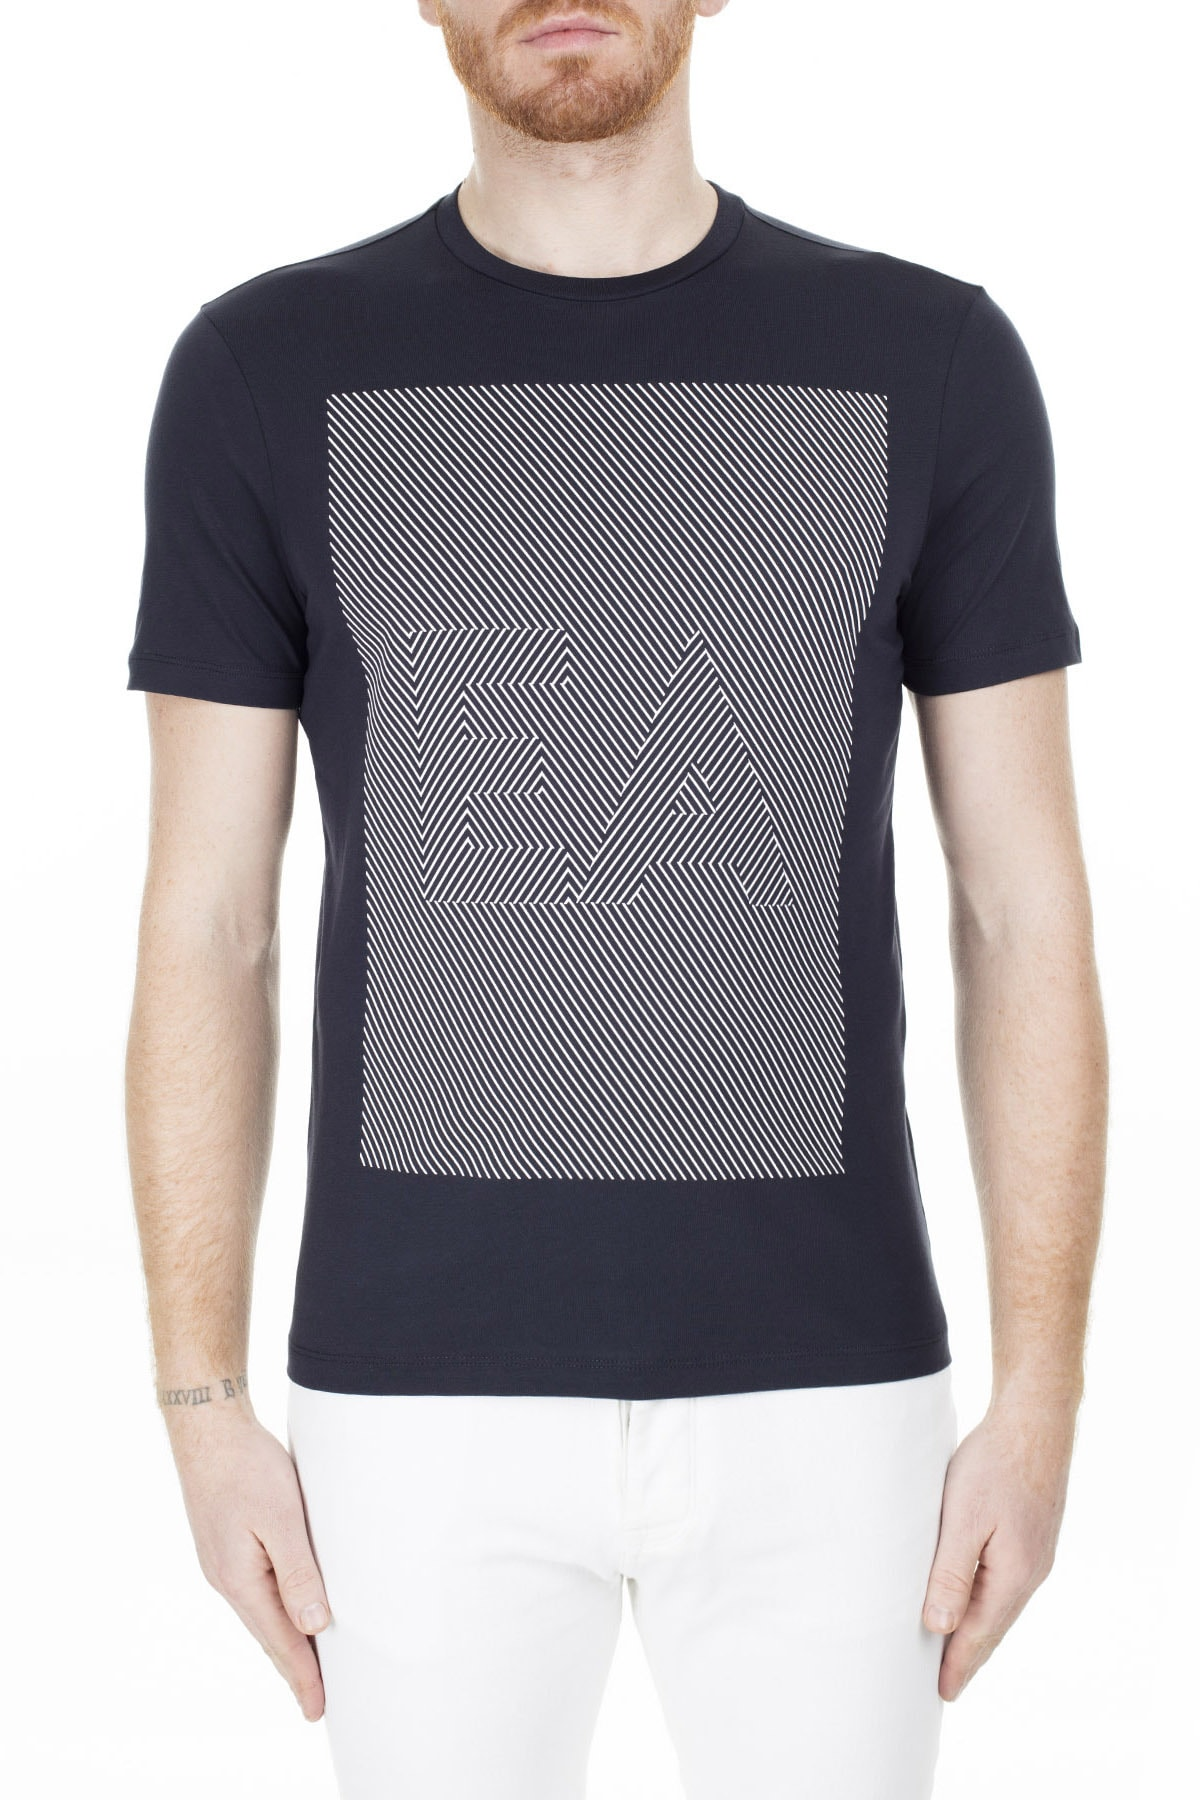 Emporio Armani T Shirt Erkek T Shirt 3H1Tb2 1Jnqz 0922